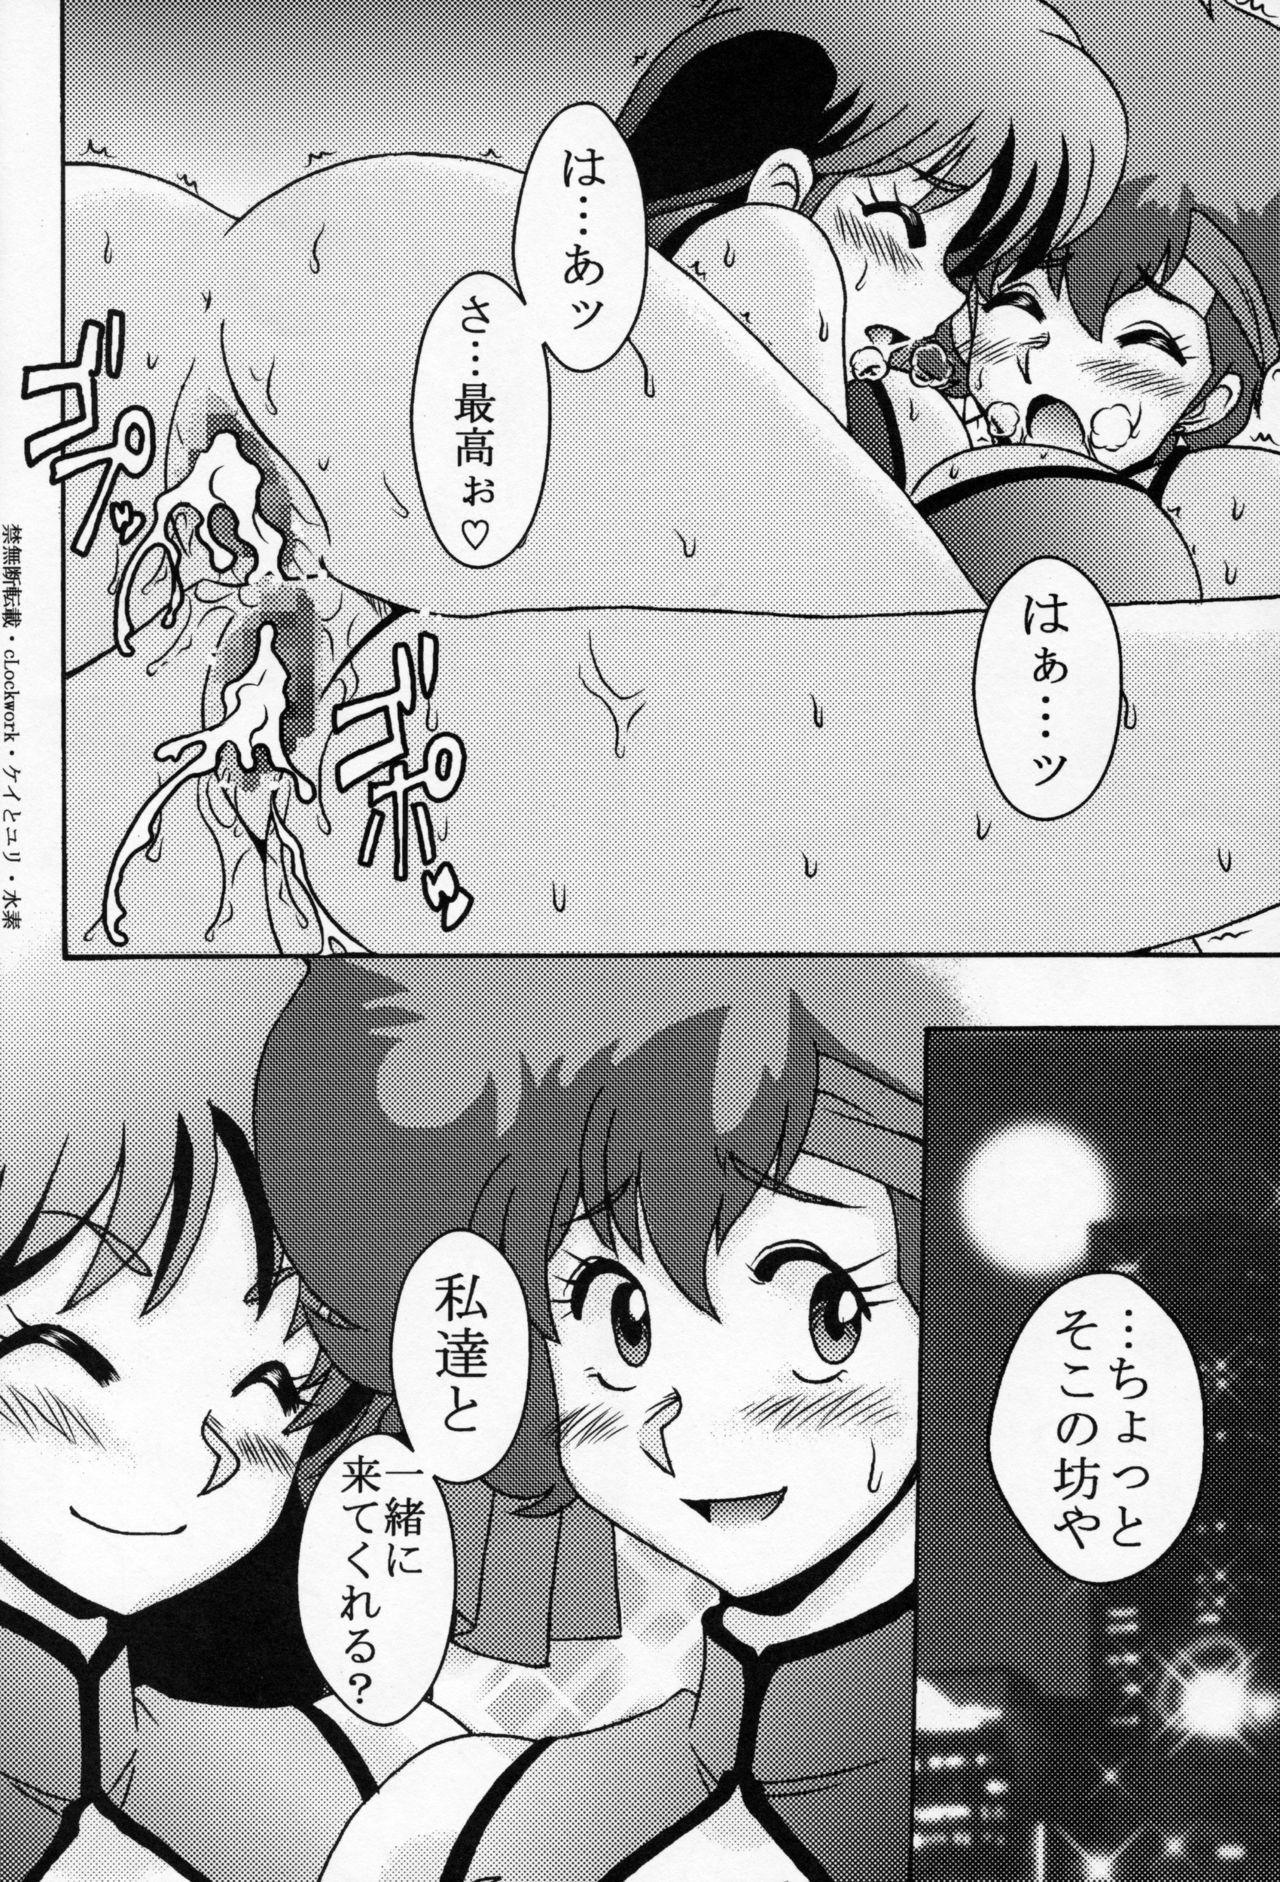 Kei to Yuri 24